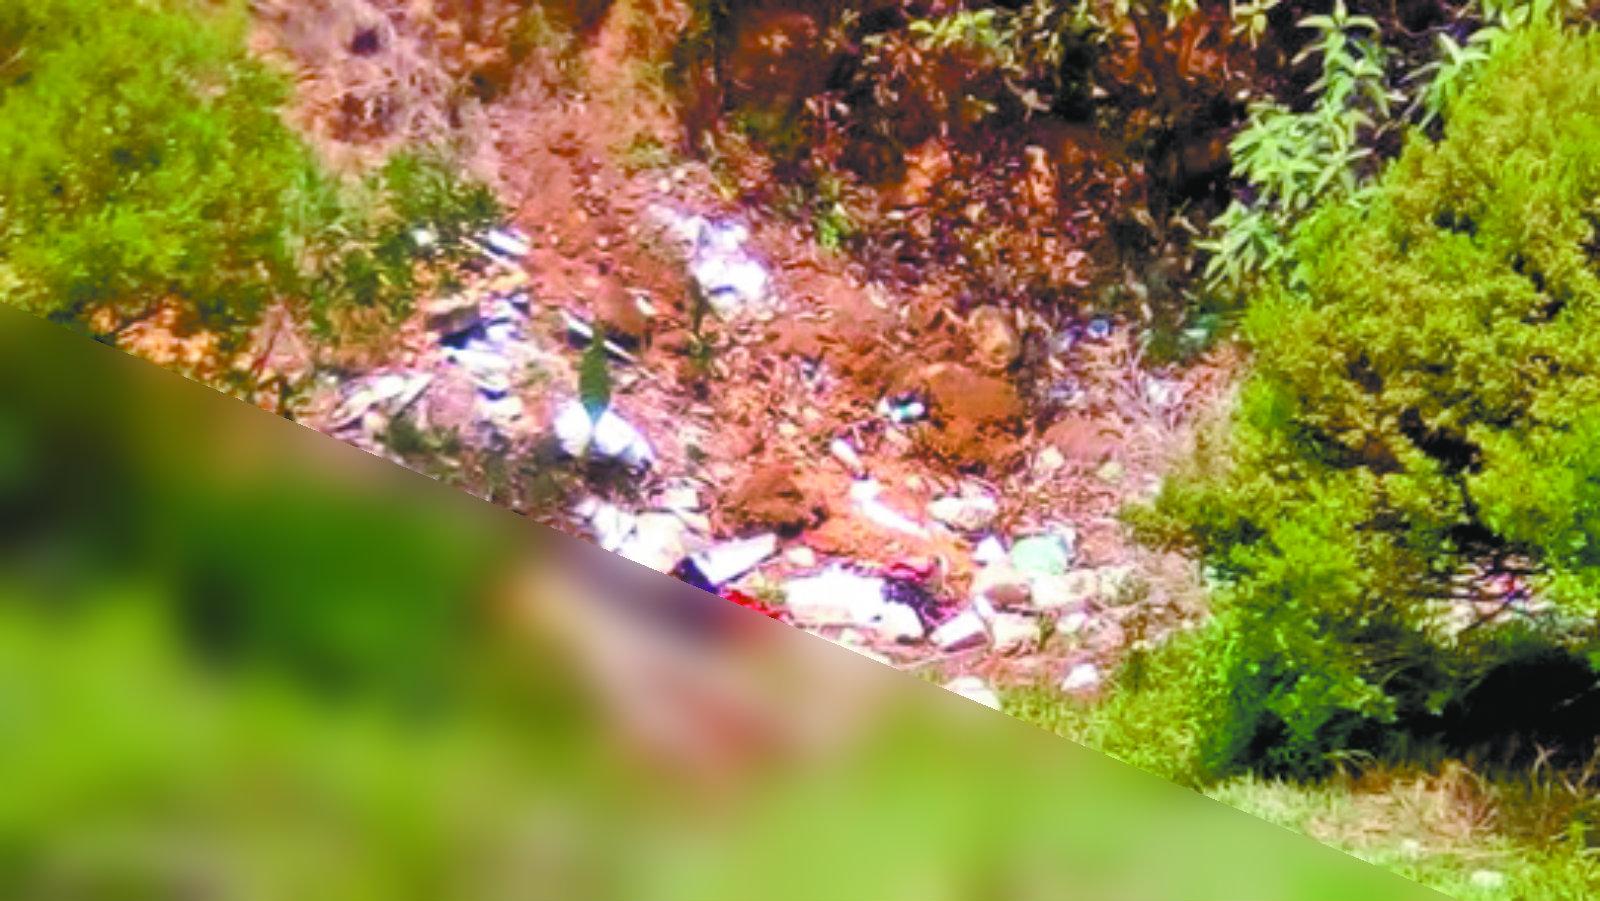 Abandonan cadáver Sin identificar Chica desnuda Feminicidio Edomex Atizapán